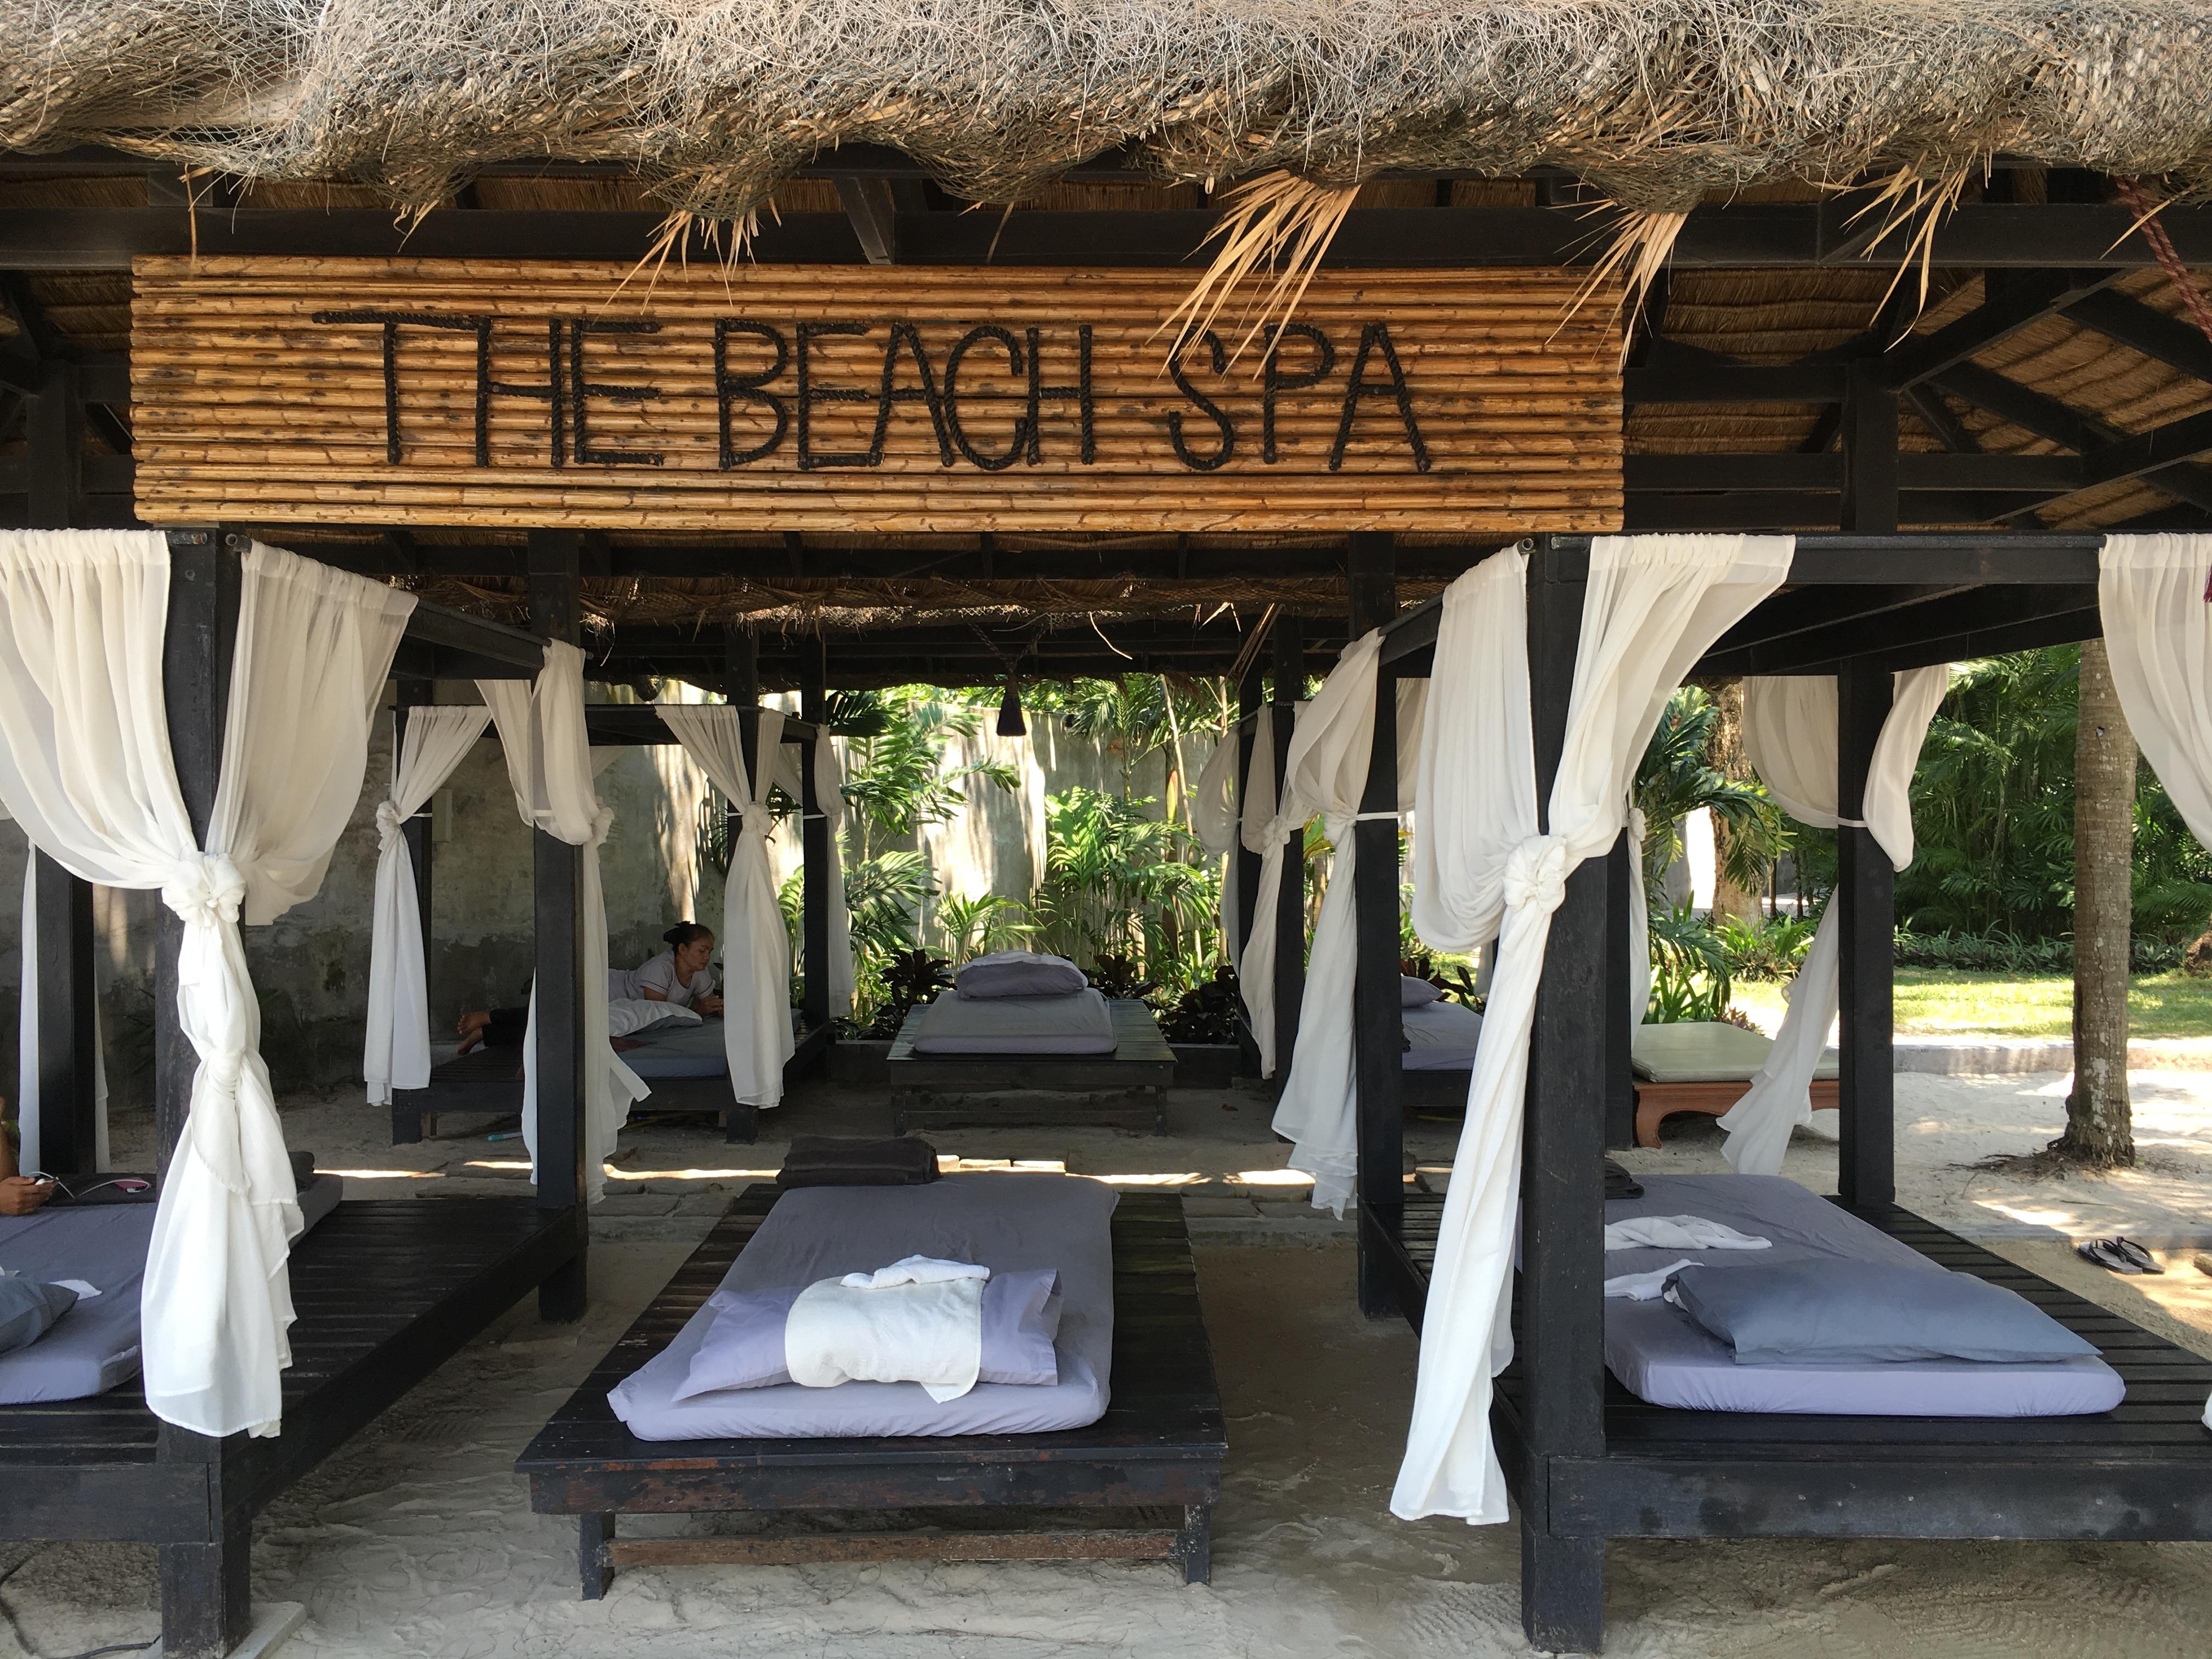 wood villa cottage asia gazebo tent thailand resort estate massage koh chang the beach spa outdoor & Free Images : wood villa cottage asia gazebo tent thailand ...